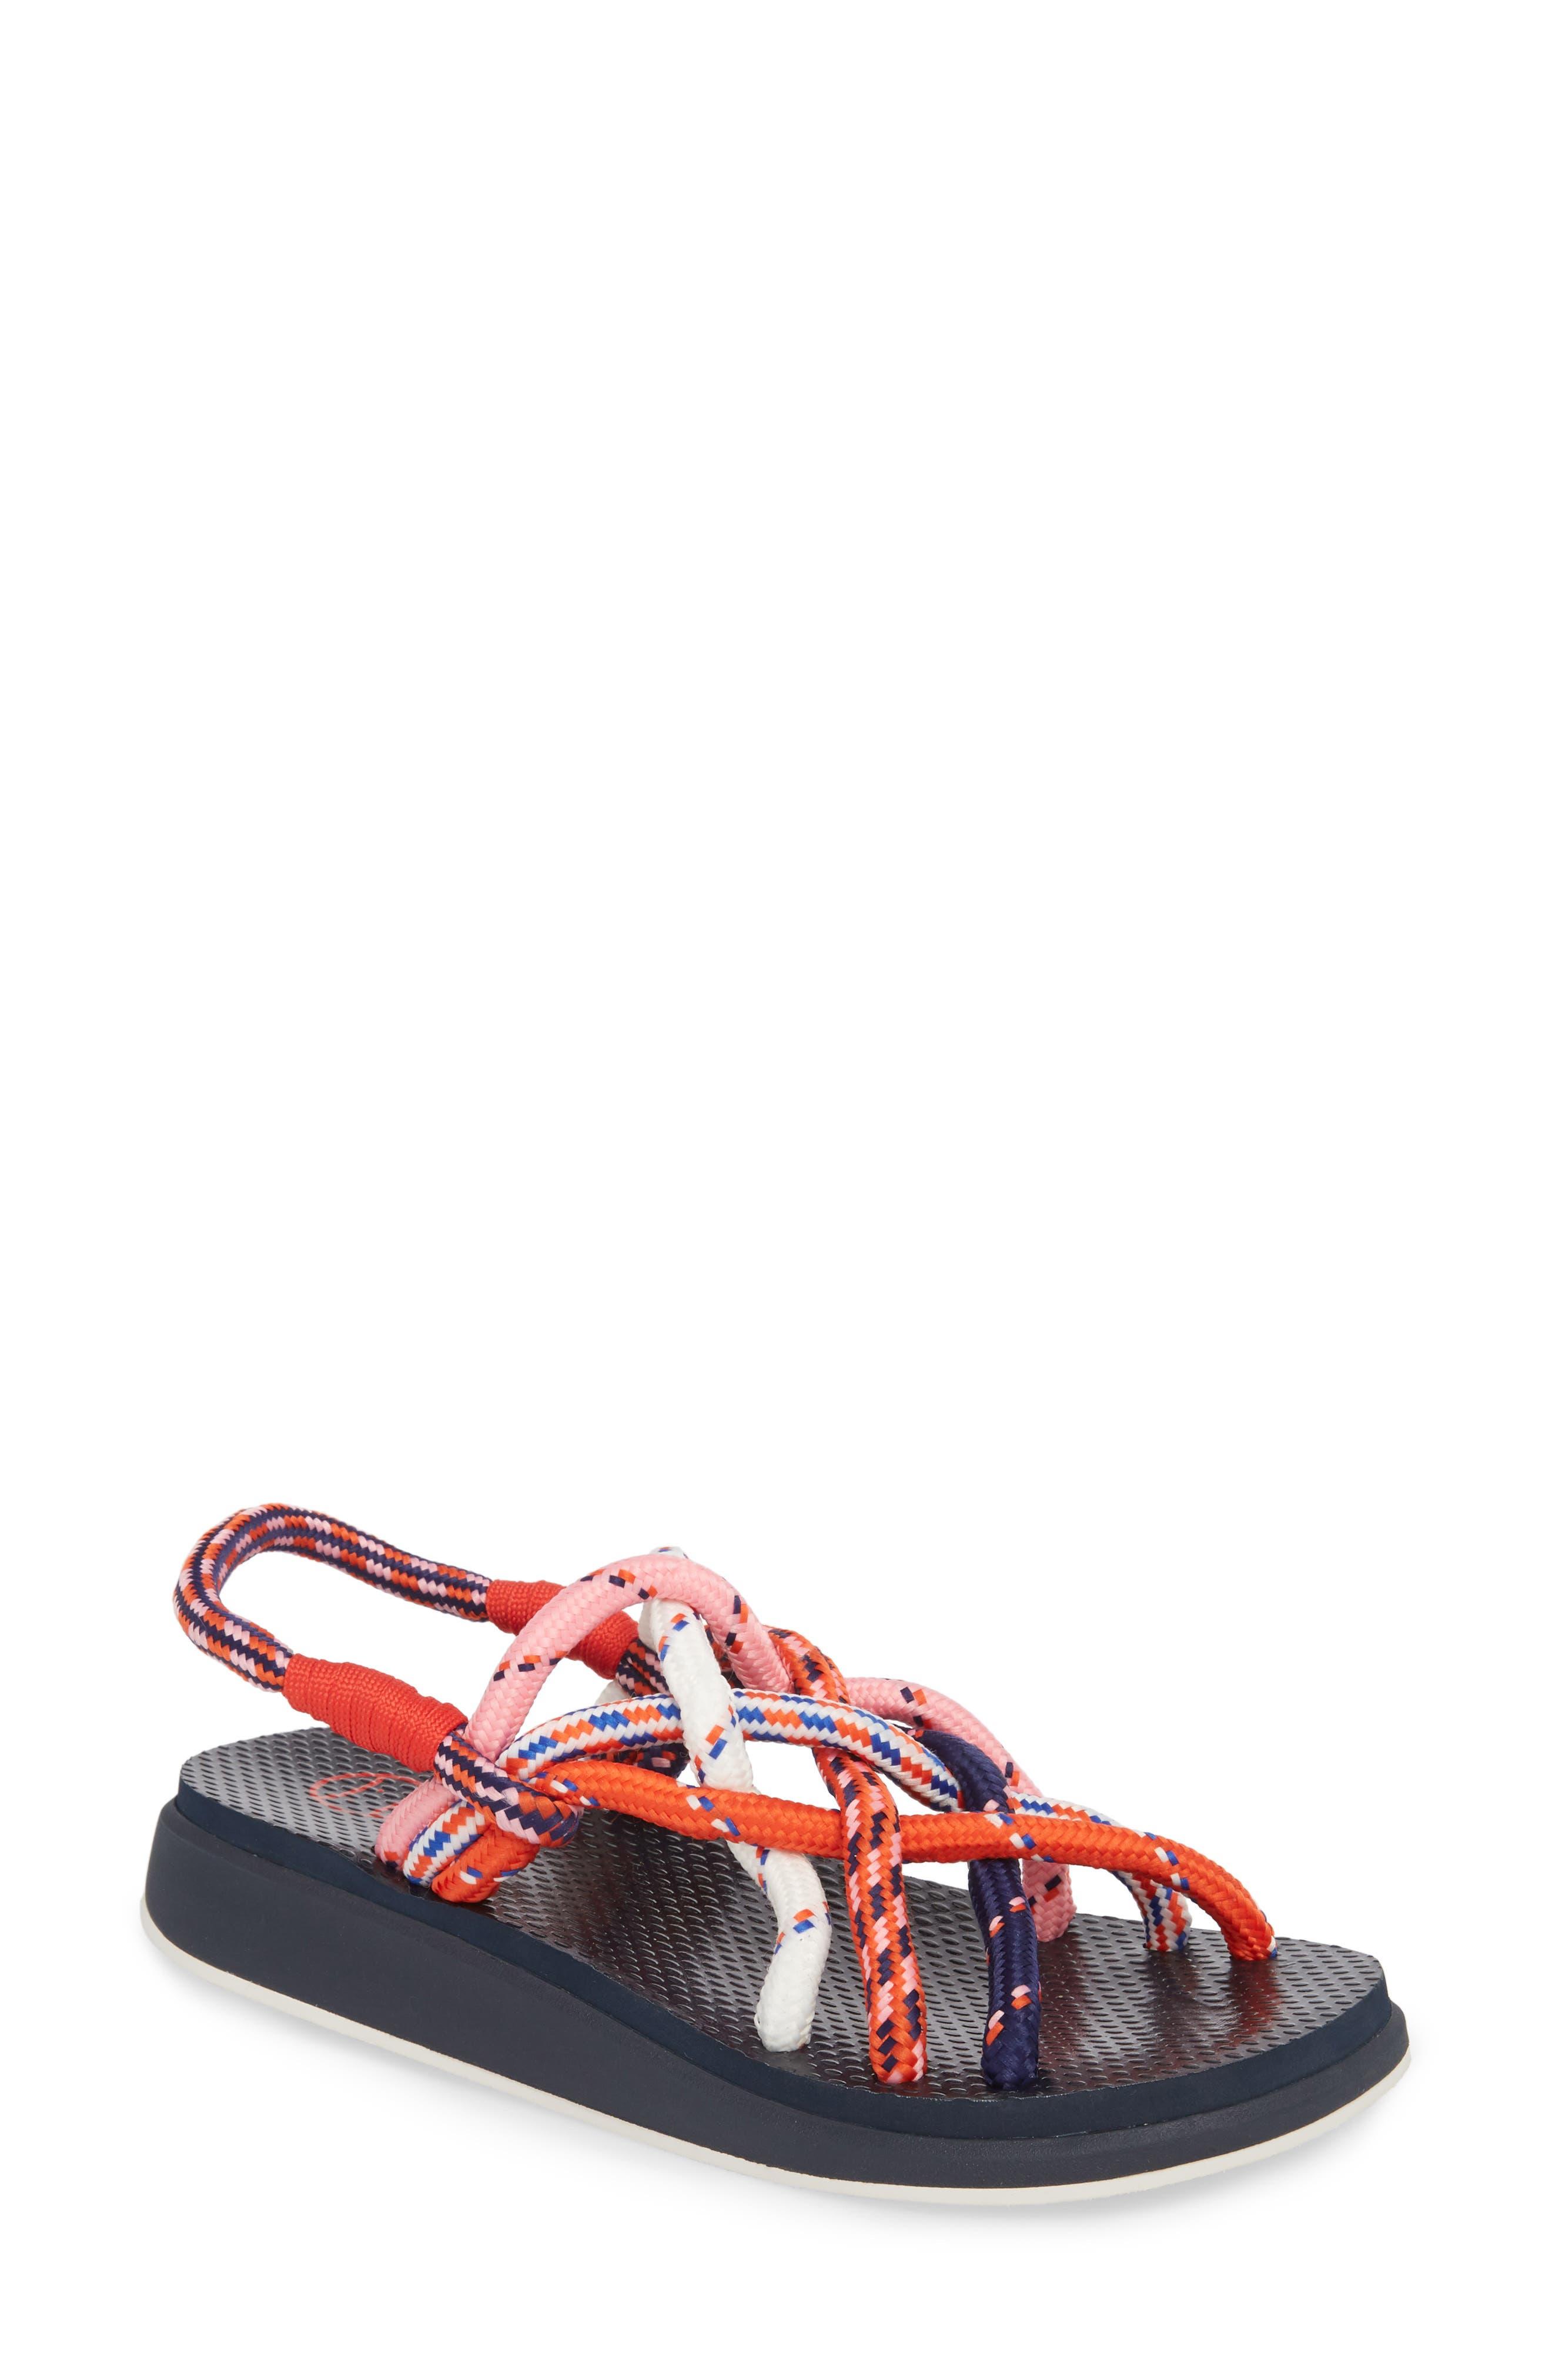 Rope Sandal,                             Main thumbnail 1, color,                             643